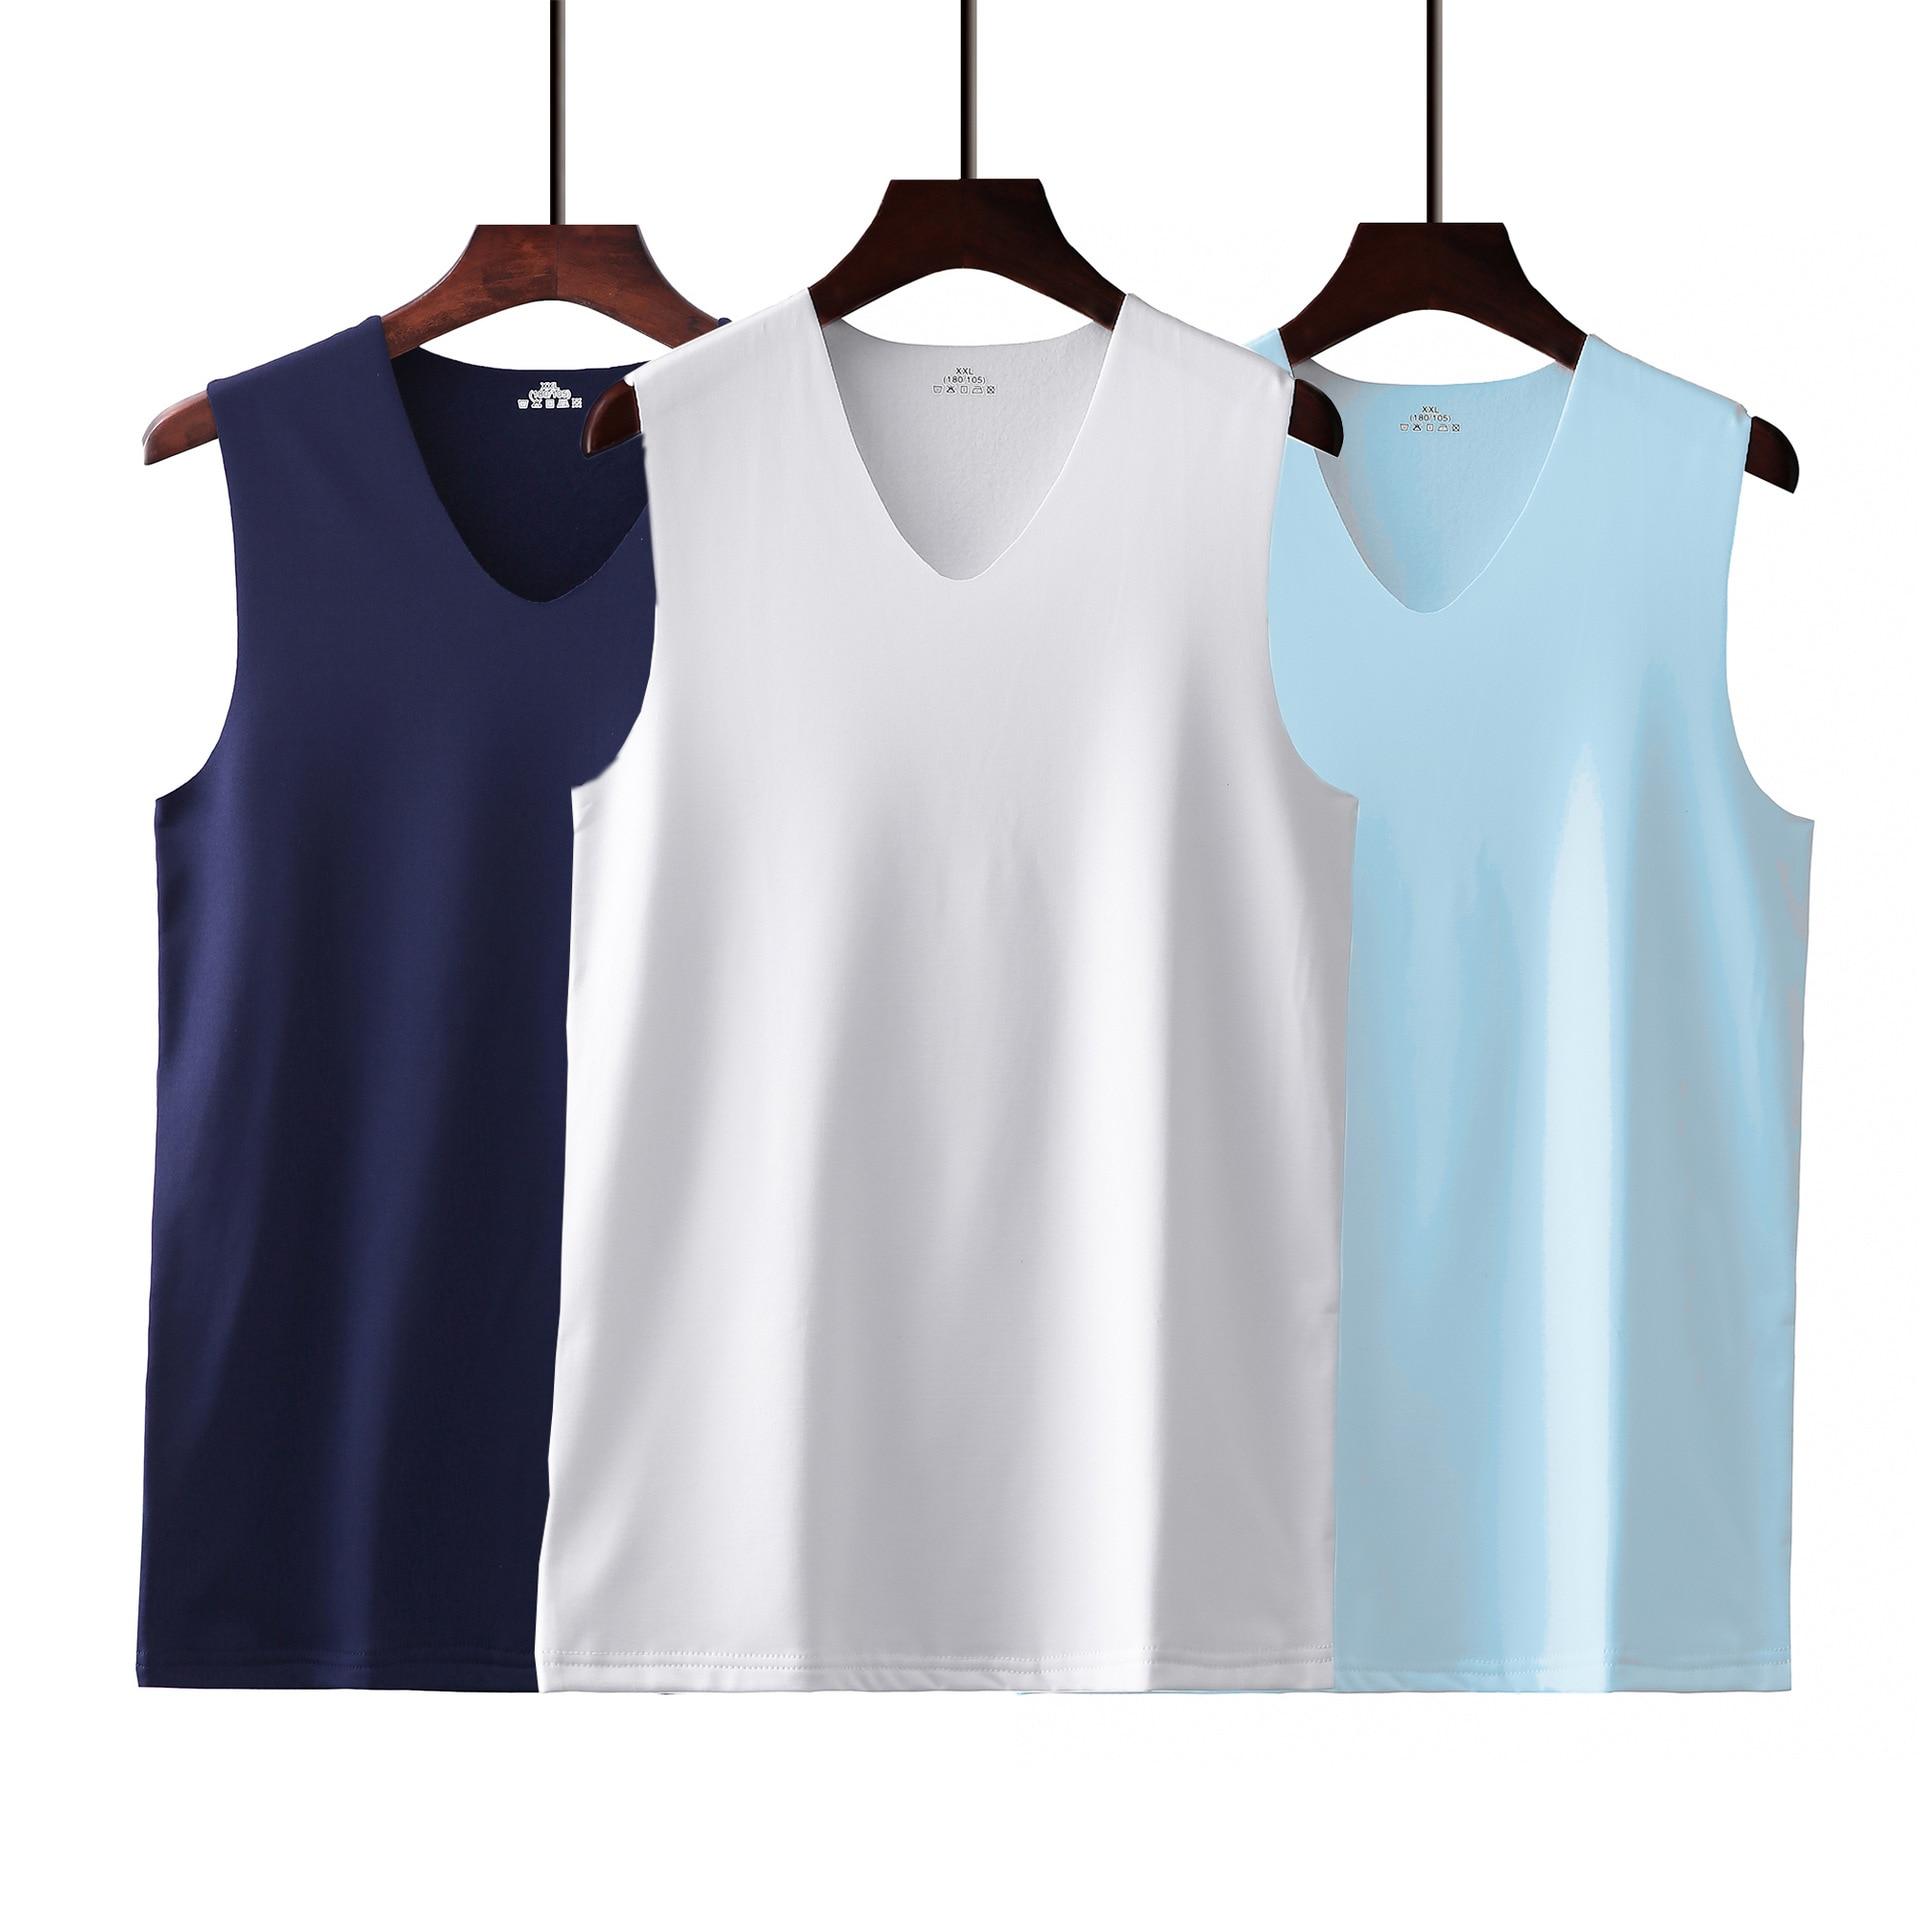 2020 Summer Ice Silk No Trace Men's Vest Thin Section Breathable Wide Shoulder V-neck Sleeveless Shirt Sport Vest M-XXXL